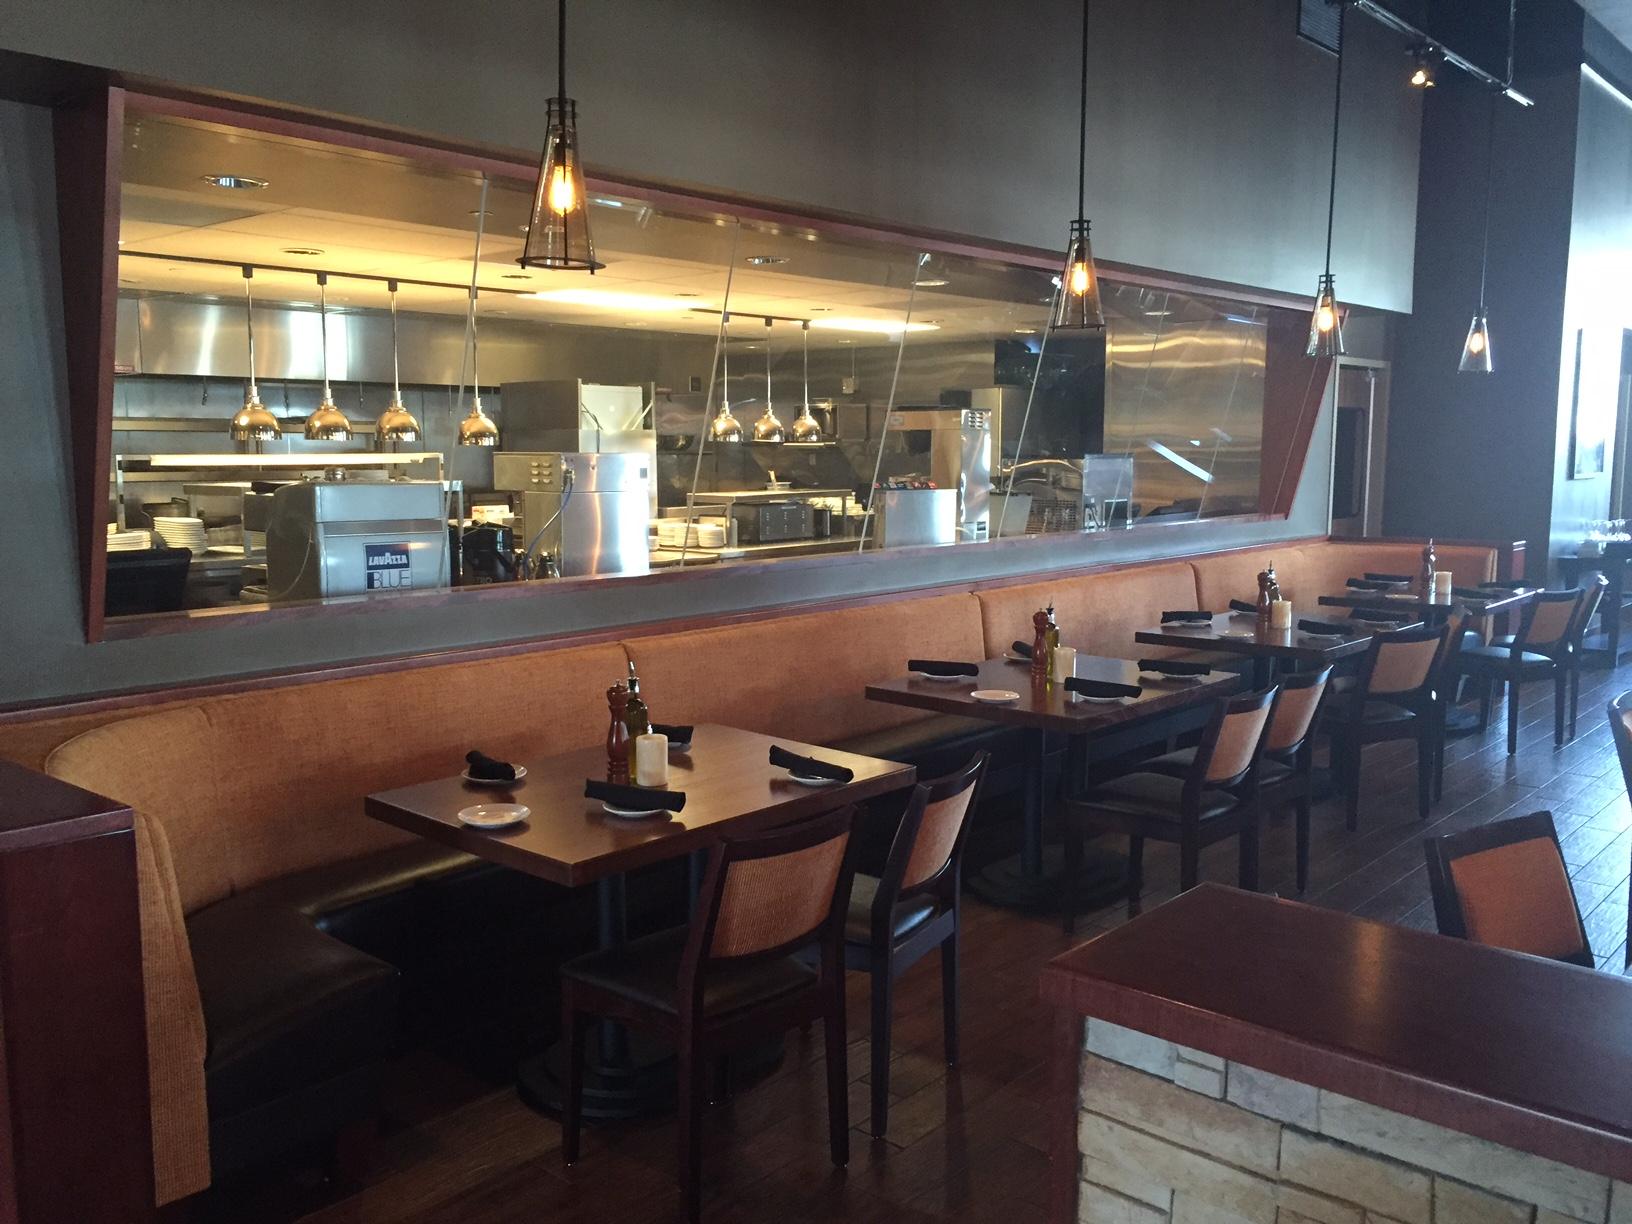 ADW-Restaurant-Travinia-Italian-Kitchen-Dining-1.JPG